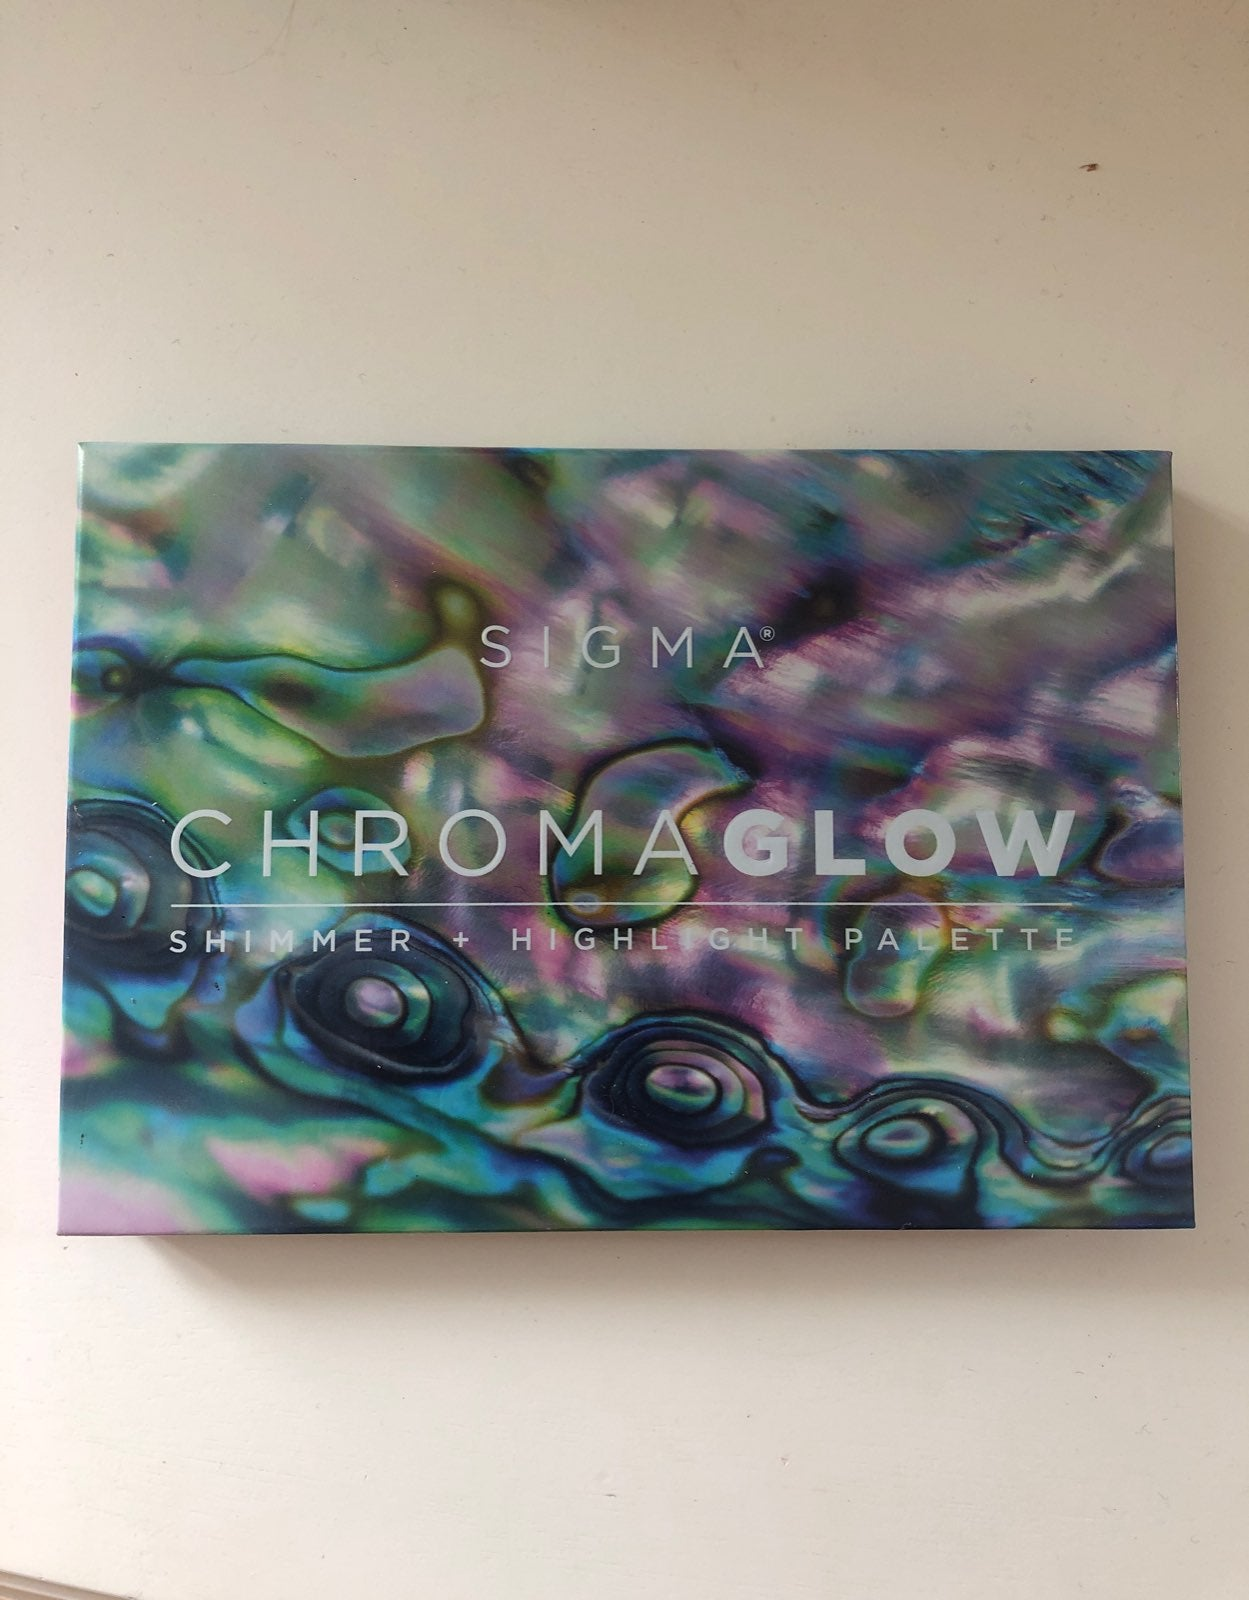 sigma chromaglow palette